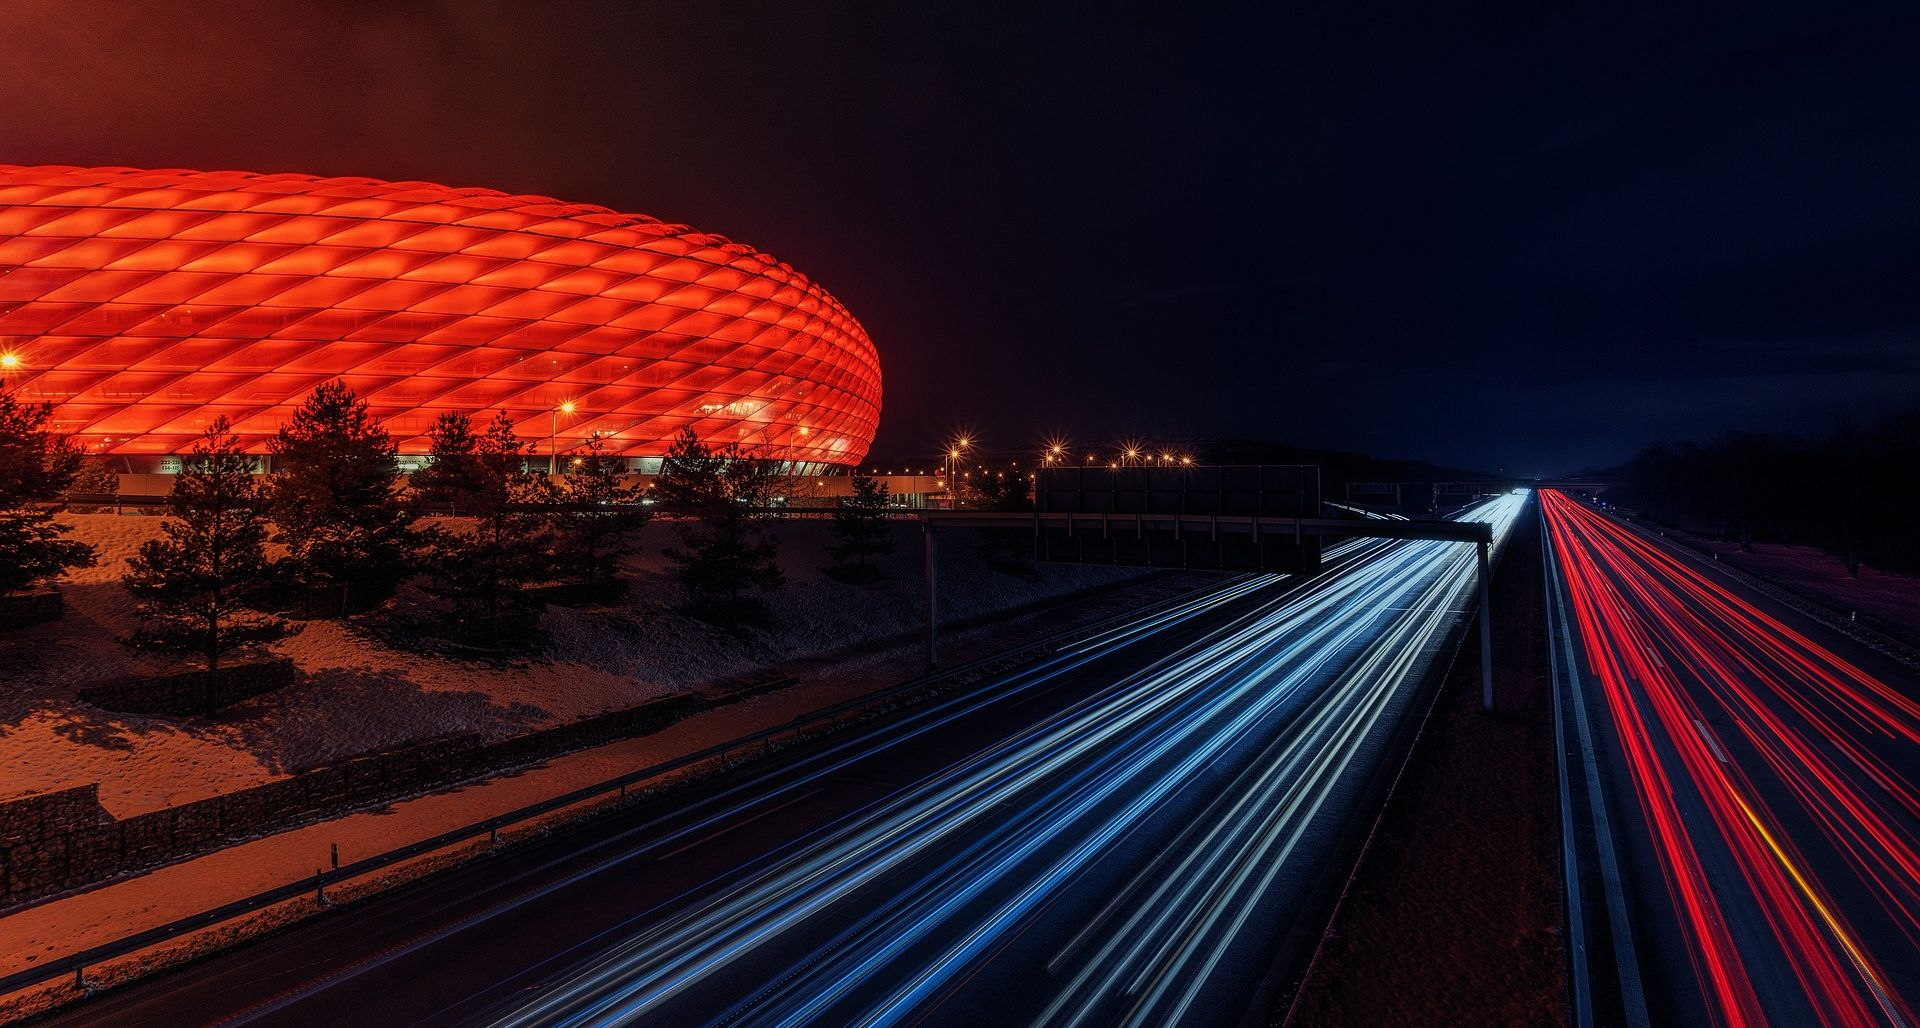 Finale Lige prvaka 2021. u Münchenu ili St. Peterburgu